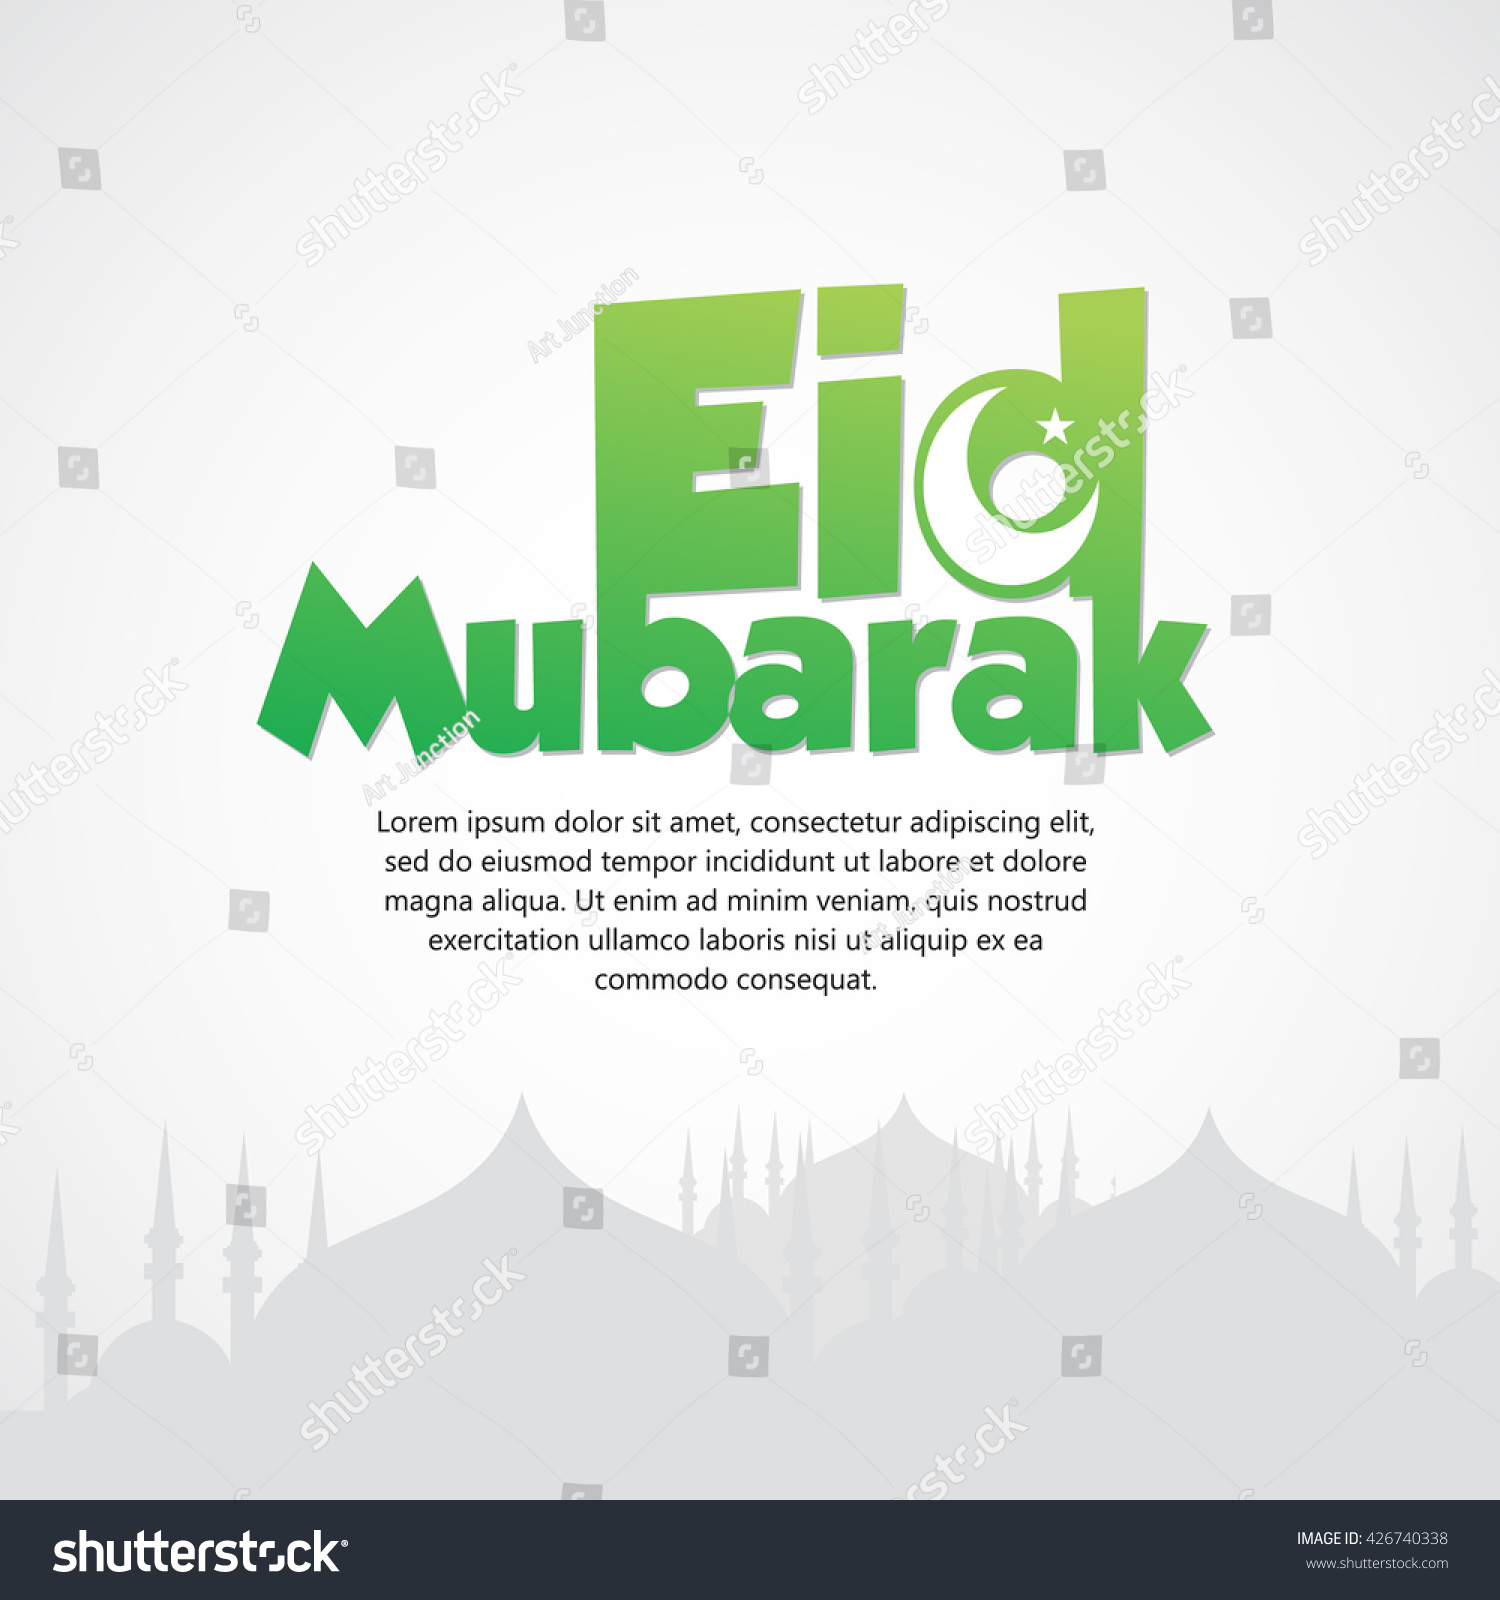 Beautiful eid mubarak card design nice stock vector 426740338 beautiful eid mubarak card design with nice colorful mosque and black background eps 10 kristyandbryce Choice Image